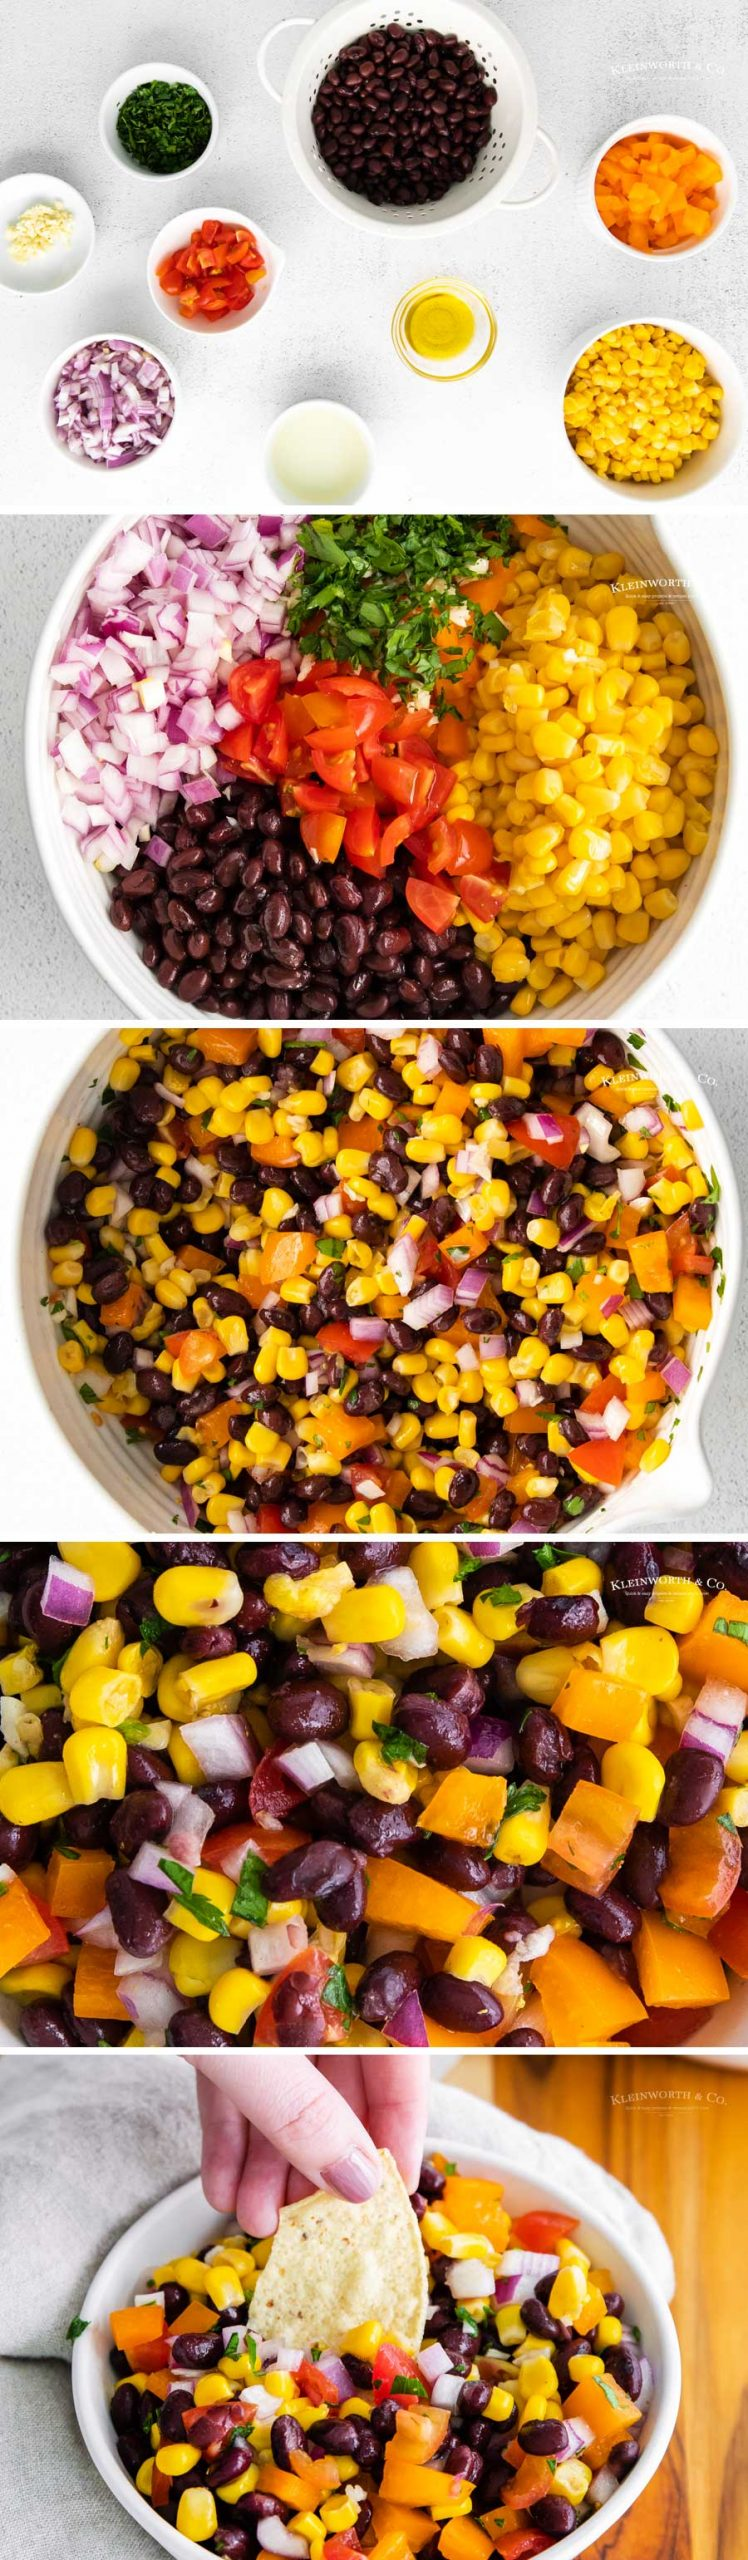 How to make Corn and Black Bean Salsa